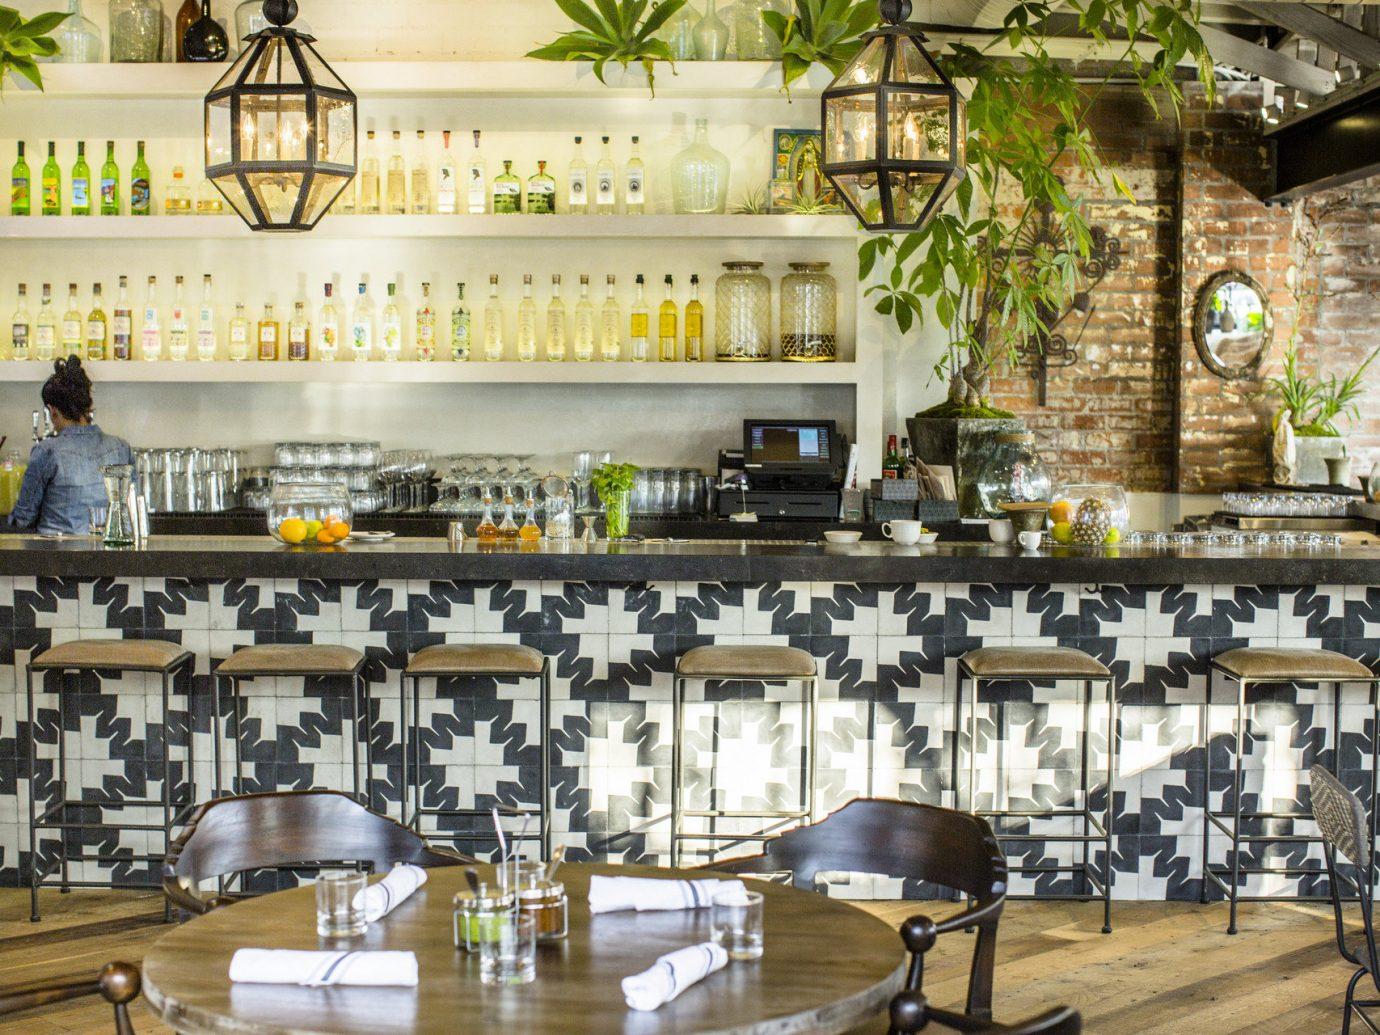 Hotels Trip Ideas indoor restaurant meal Bar interior design